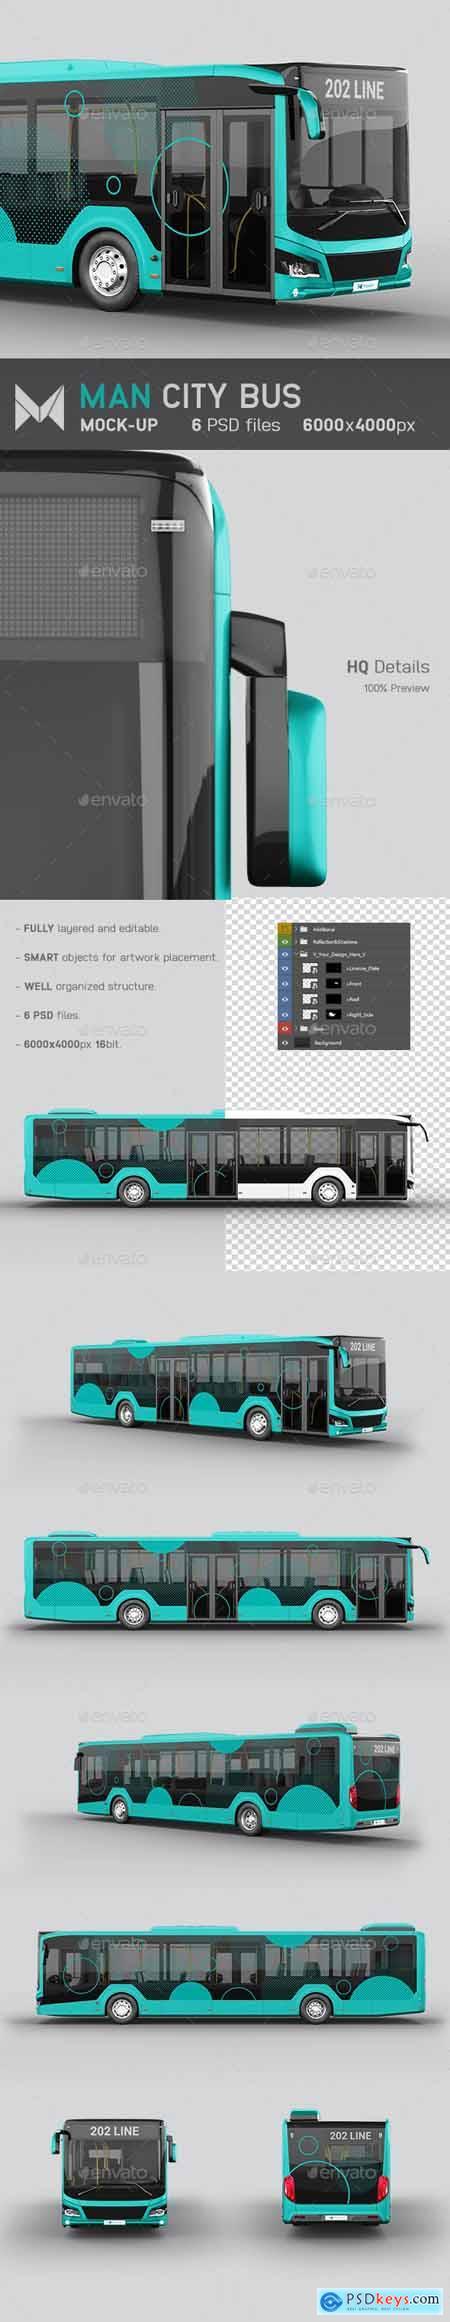 Man City Bus Mockup 25580351